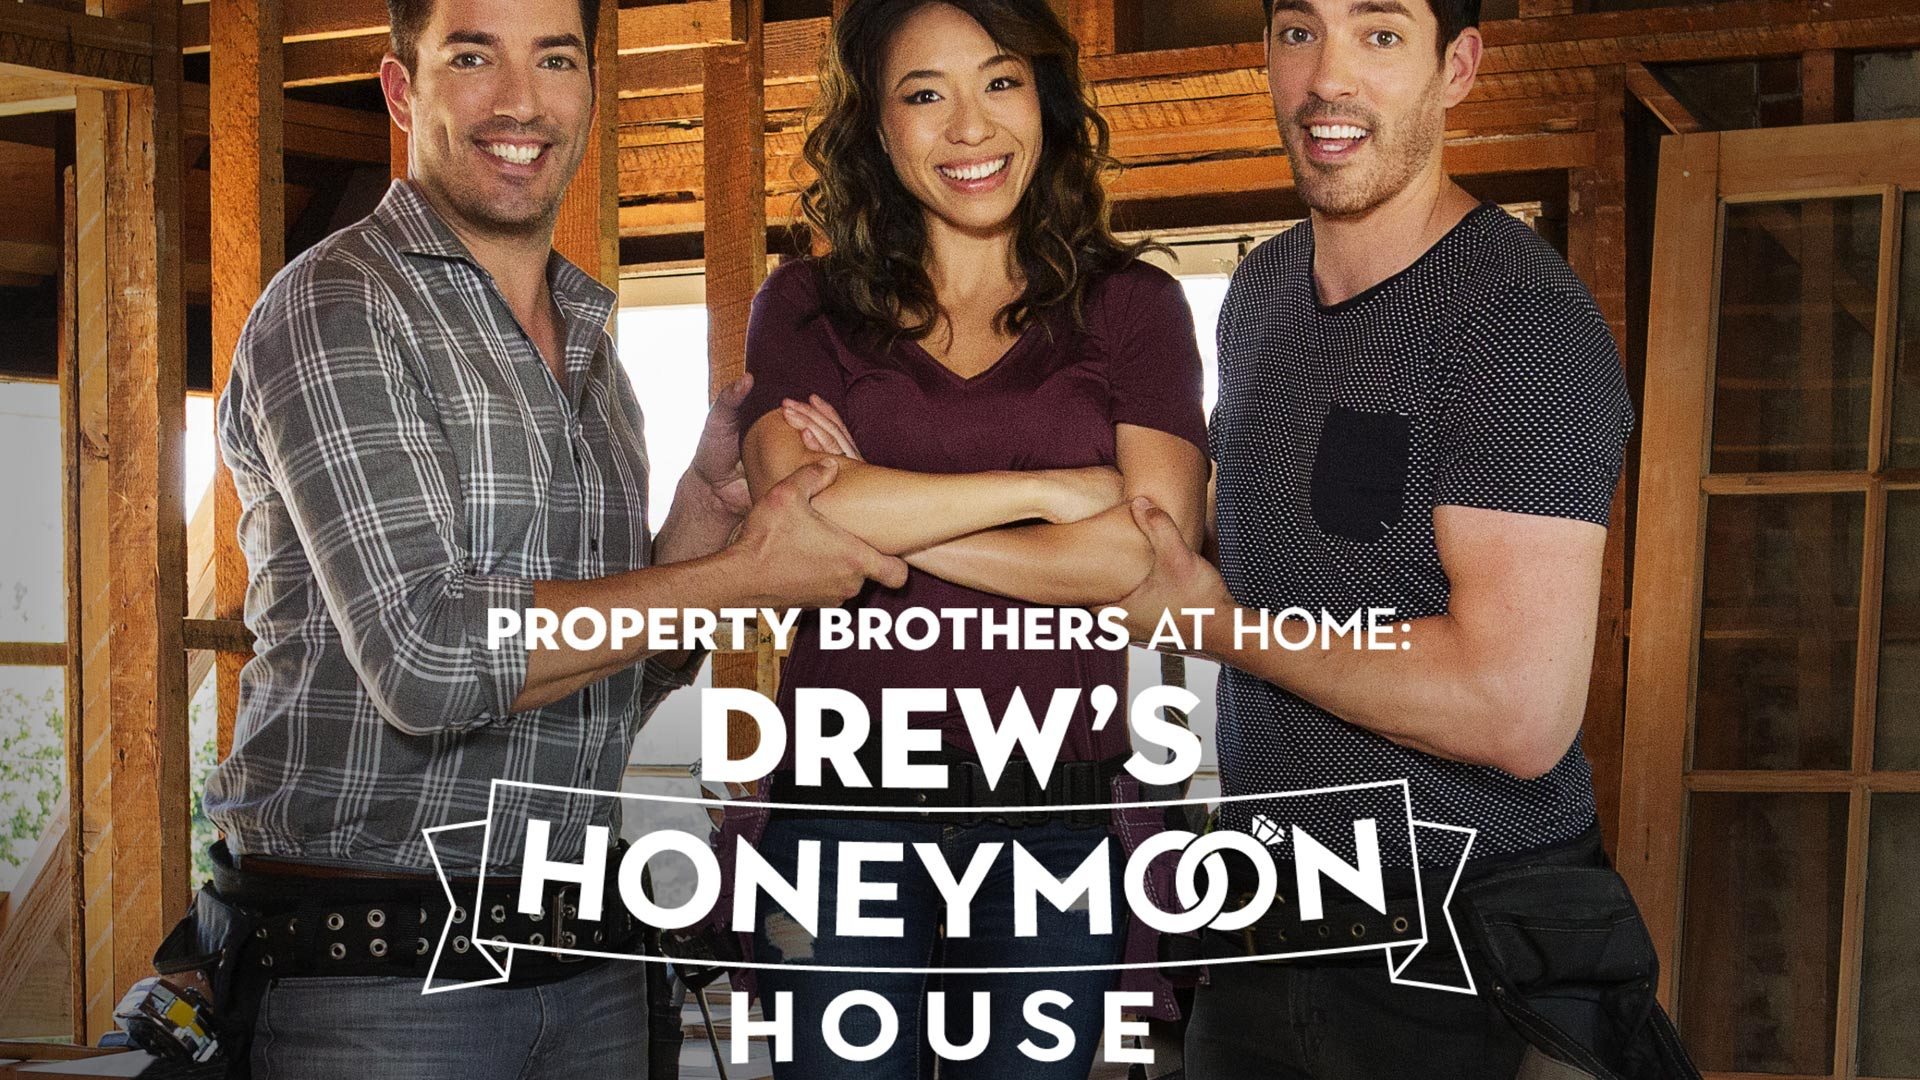 Property Brothers at Home: Drew's Honeymoon House, Season 3